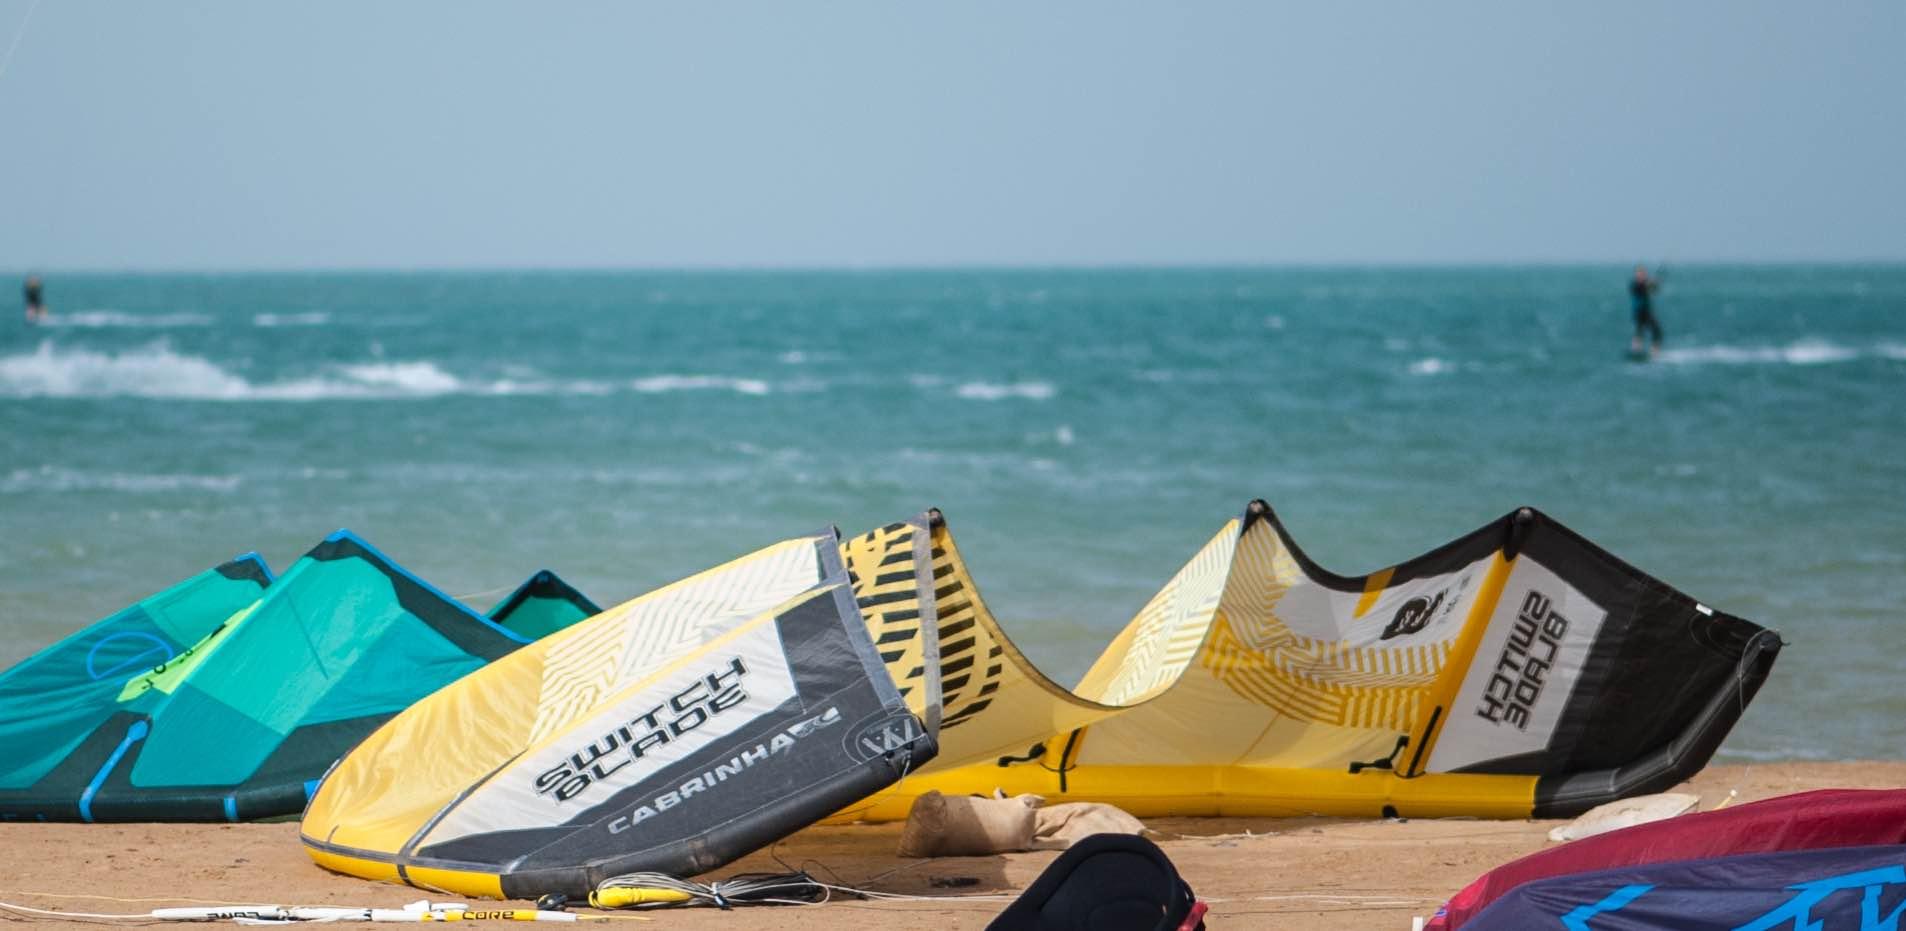 Kiteboarding El Gouna with big kitesurfing areas